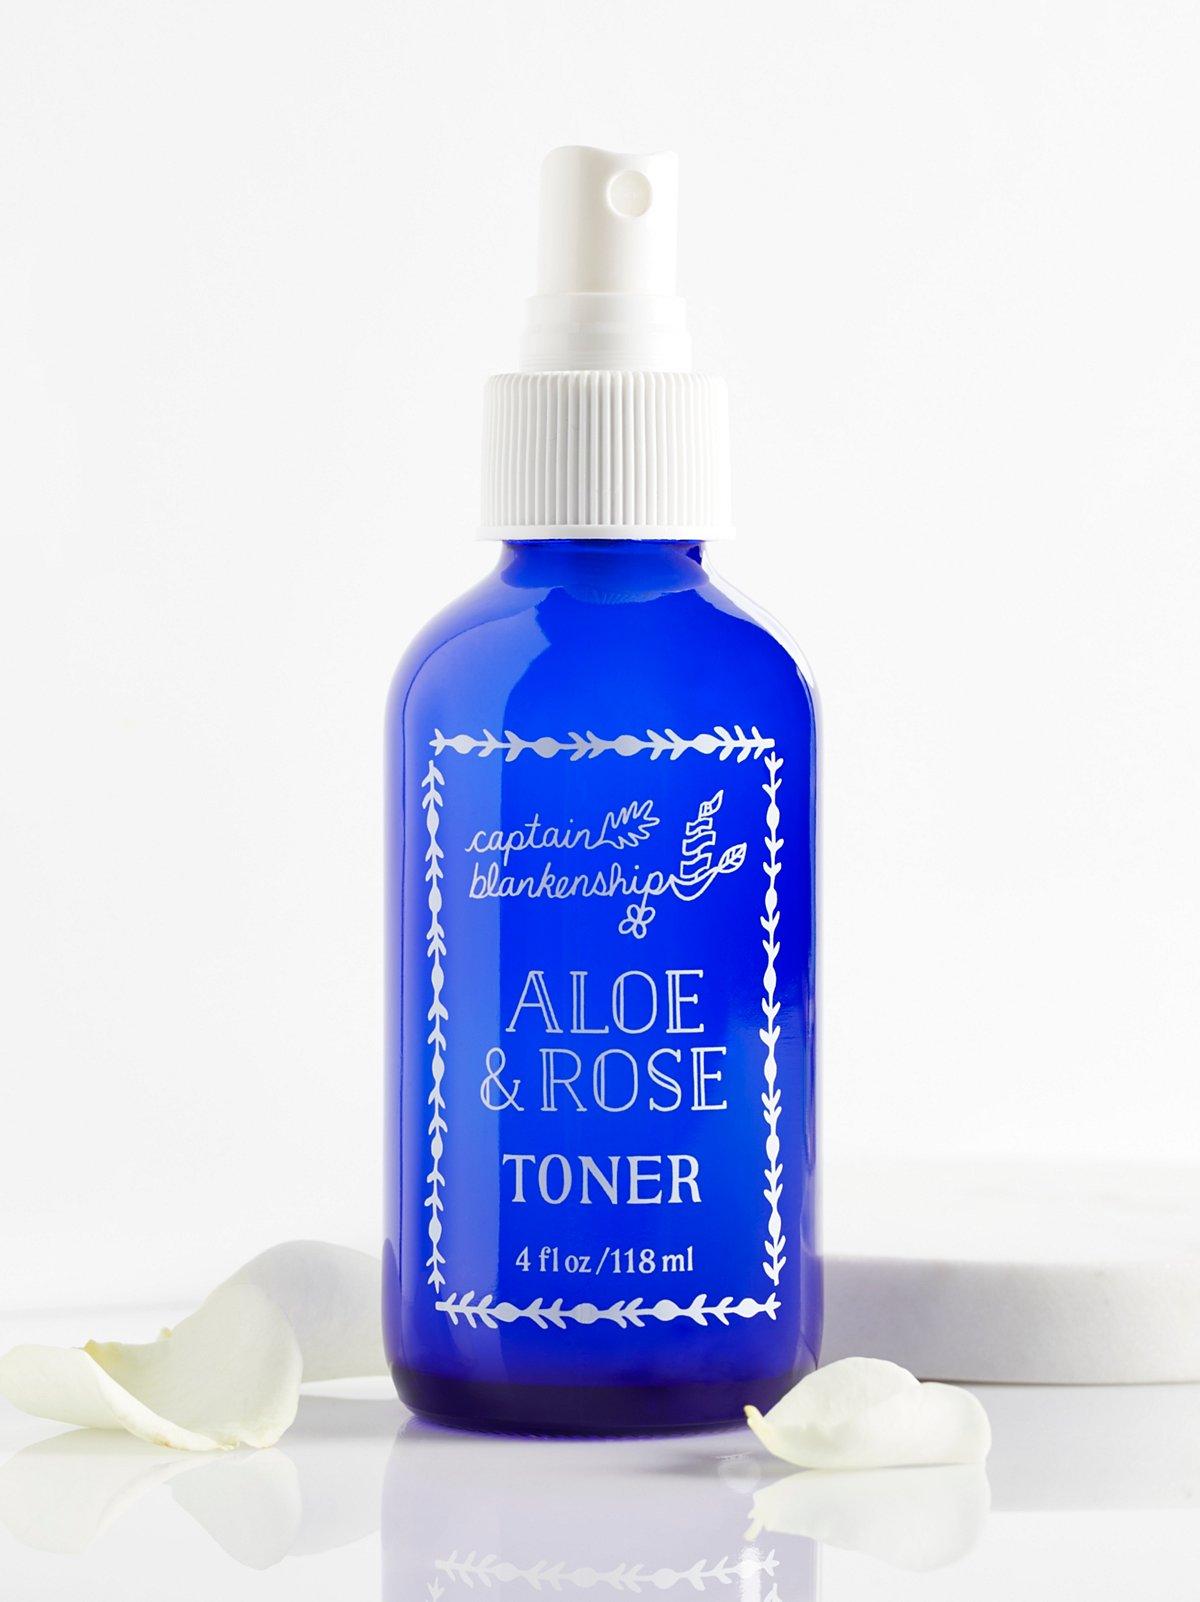 Aloe & Rose Toner